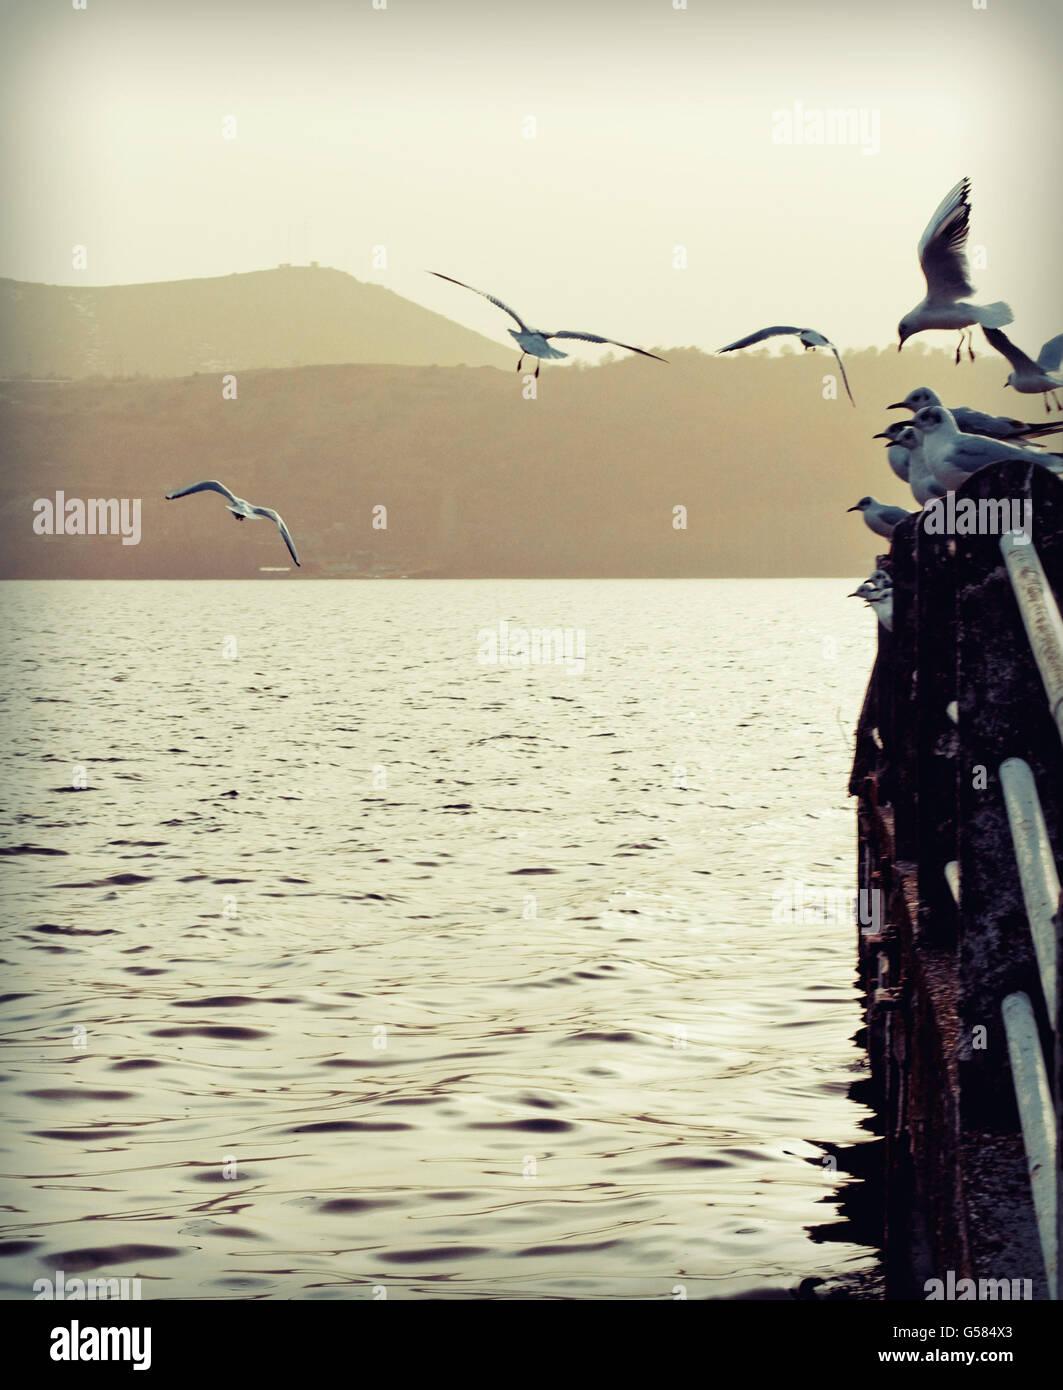 Seagulls - Stock Image